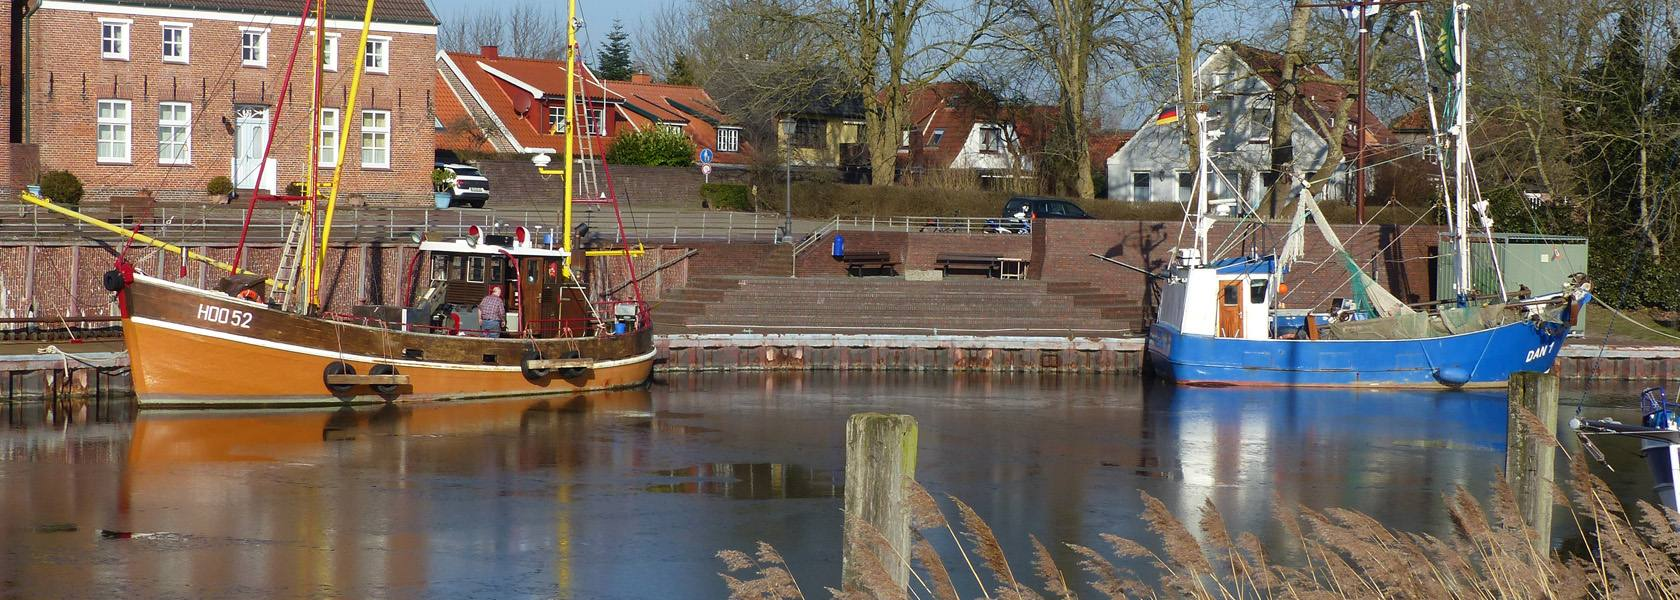 Alter Hafen Hooksiel, © Die Nordsee GmbH, Jantje Olchers